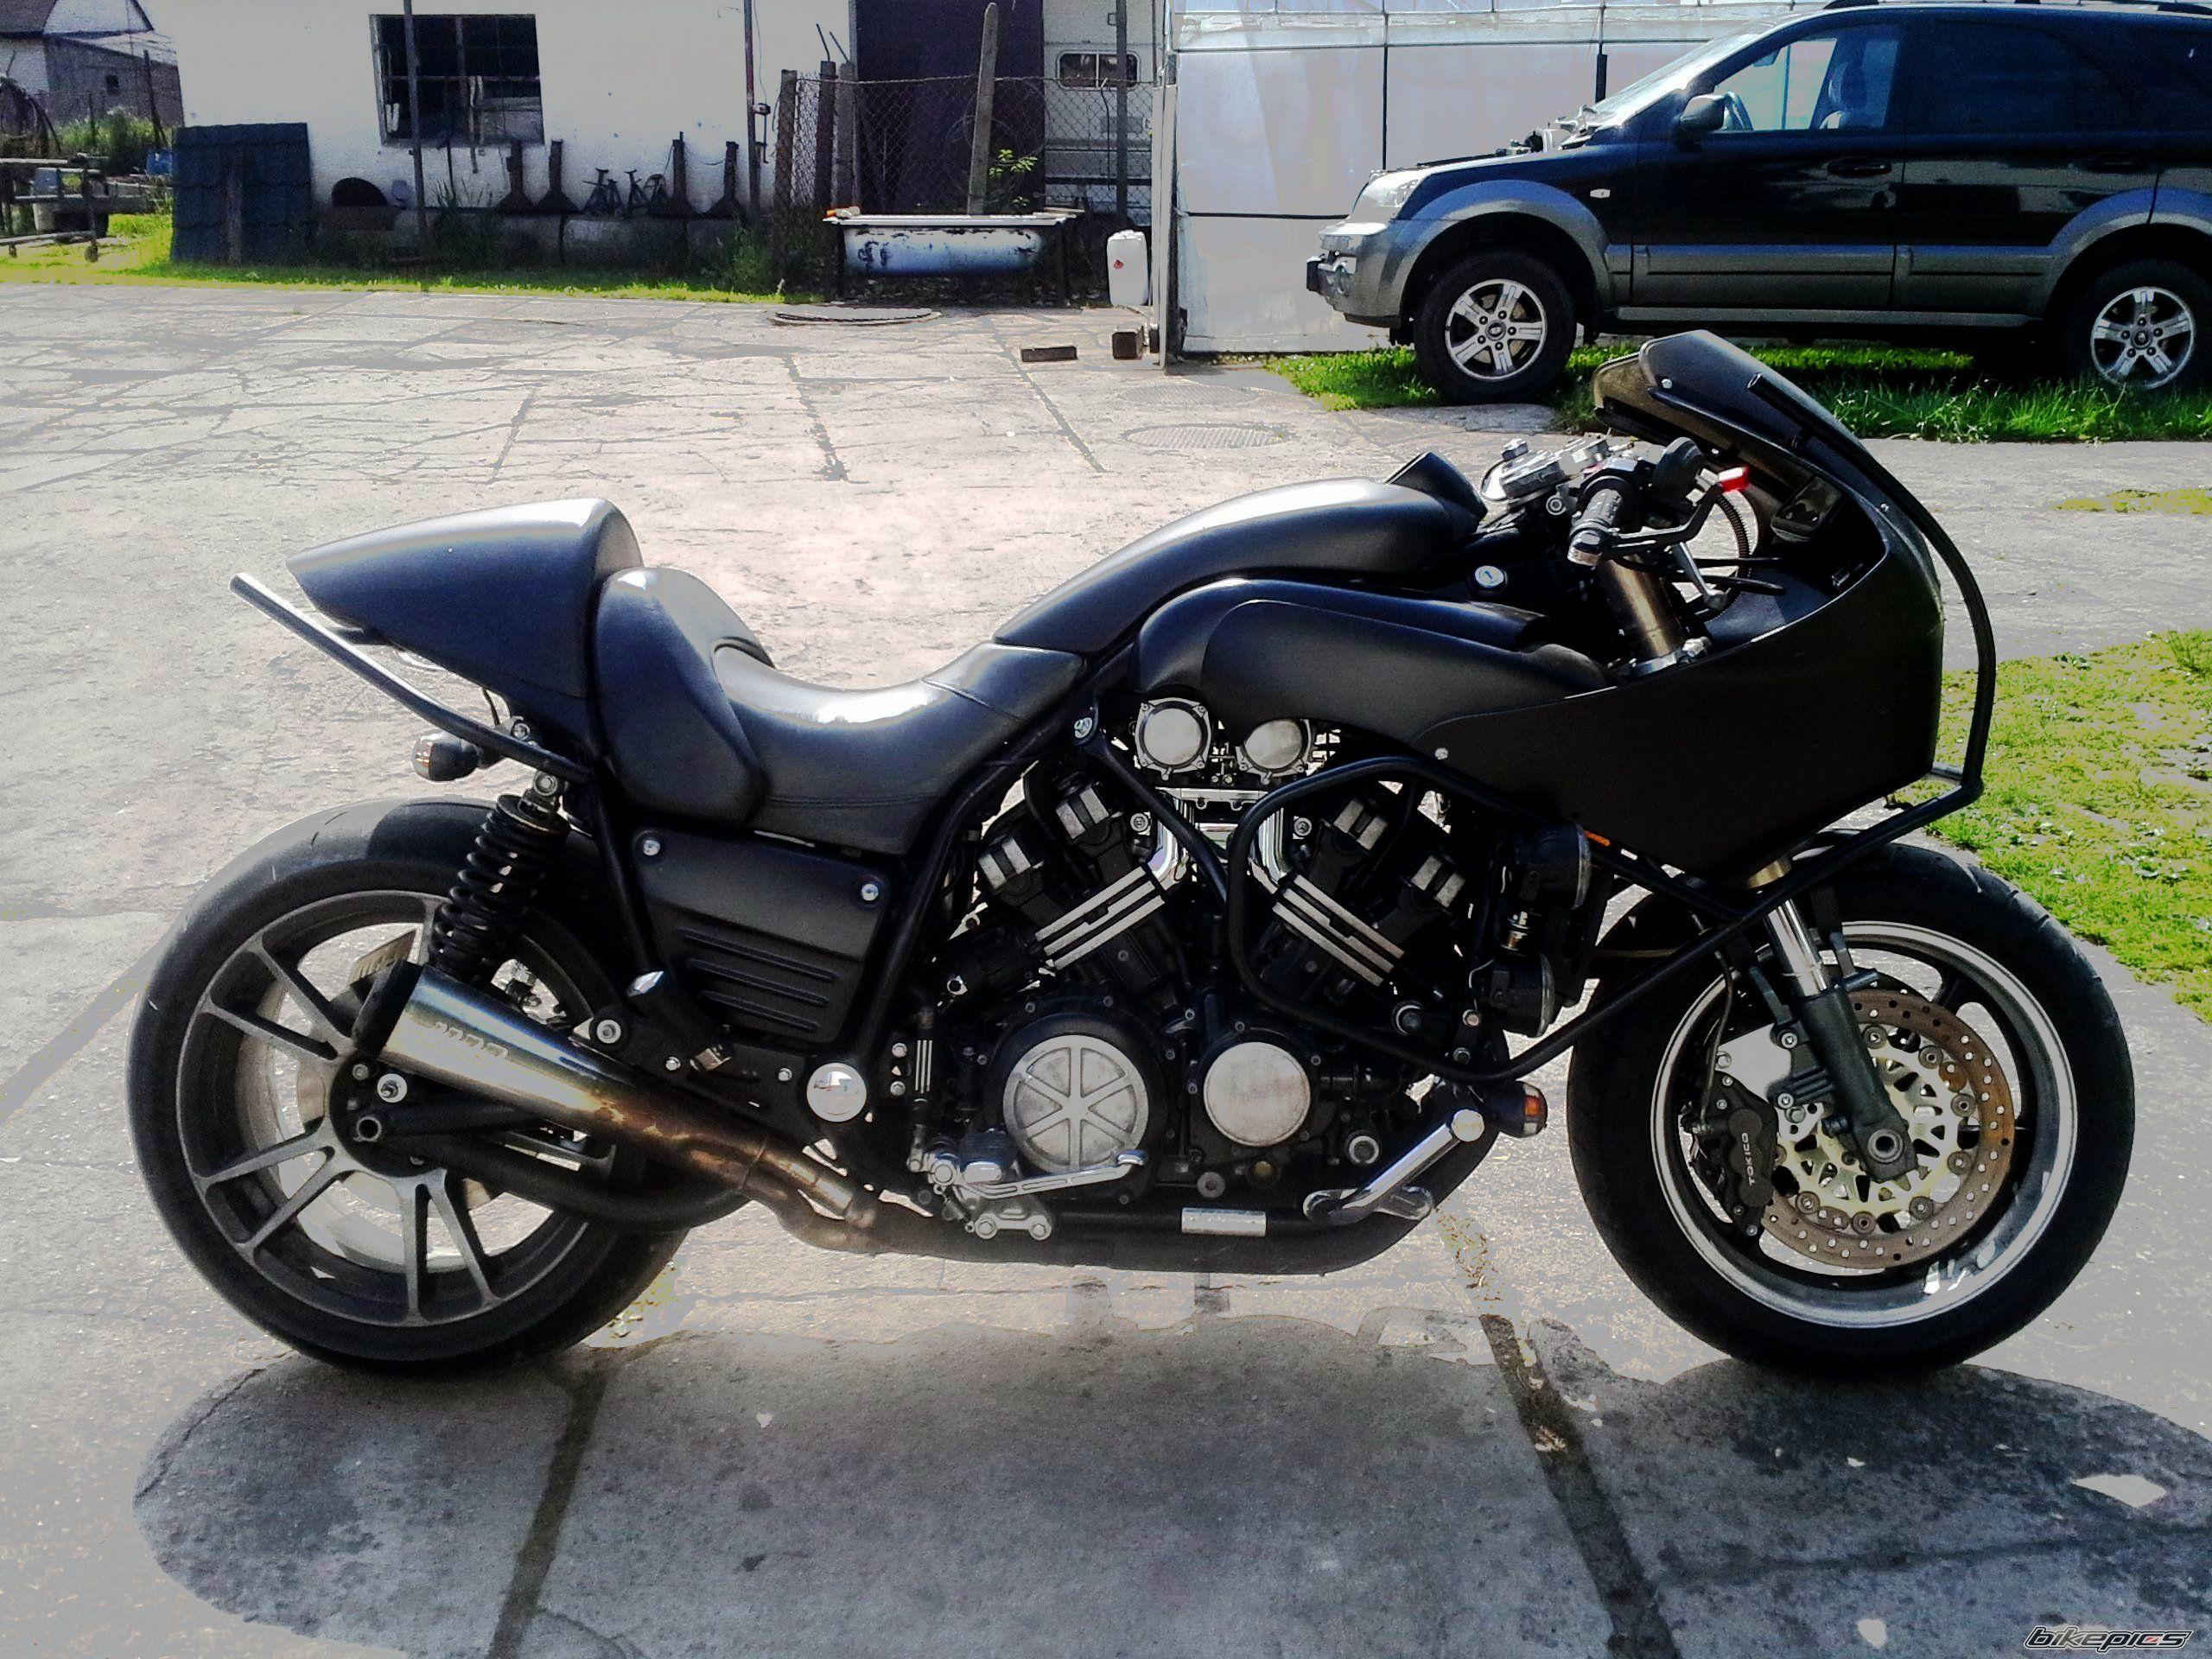 Vmax Custom Yamaha 1200 Pinterest Bikes And Cars Fuel Filter